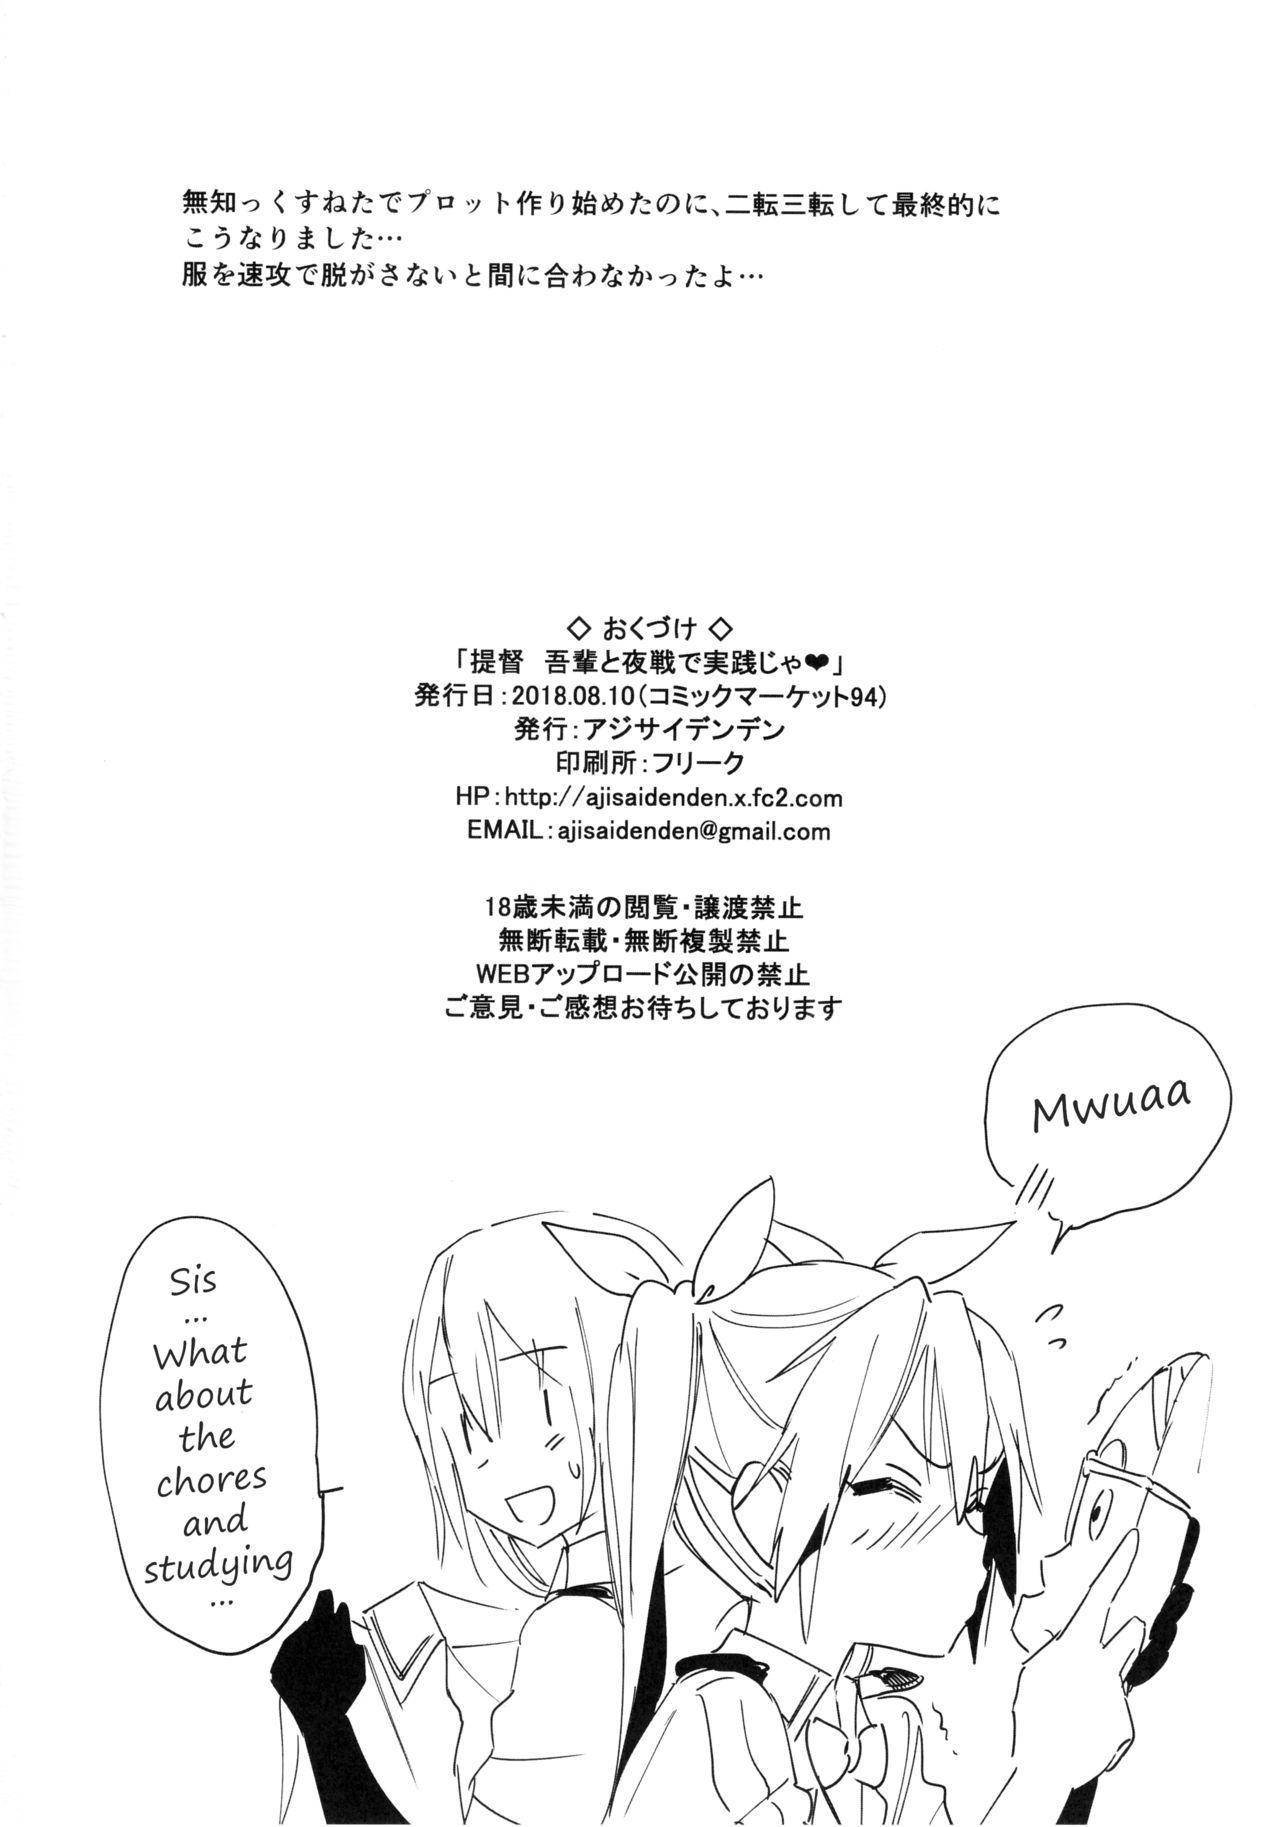 Teitoku yo Wagahai to Yasen de Jissen ja | Hey Admiral! Practice night battles with me! 24